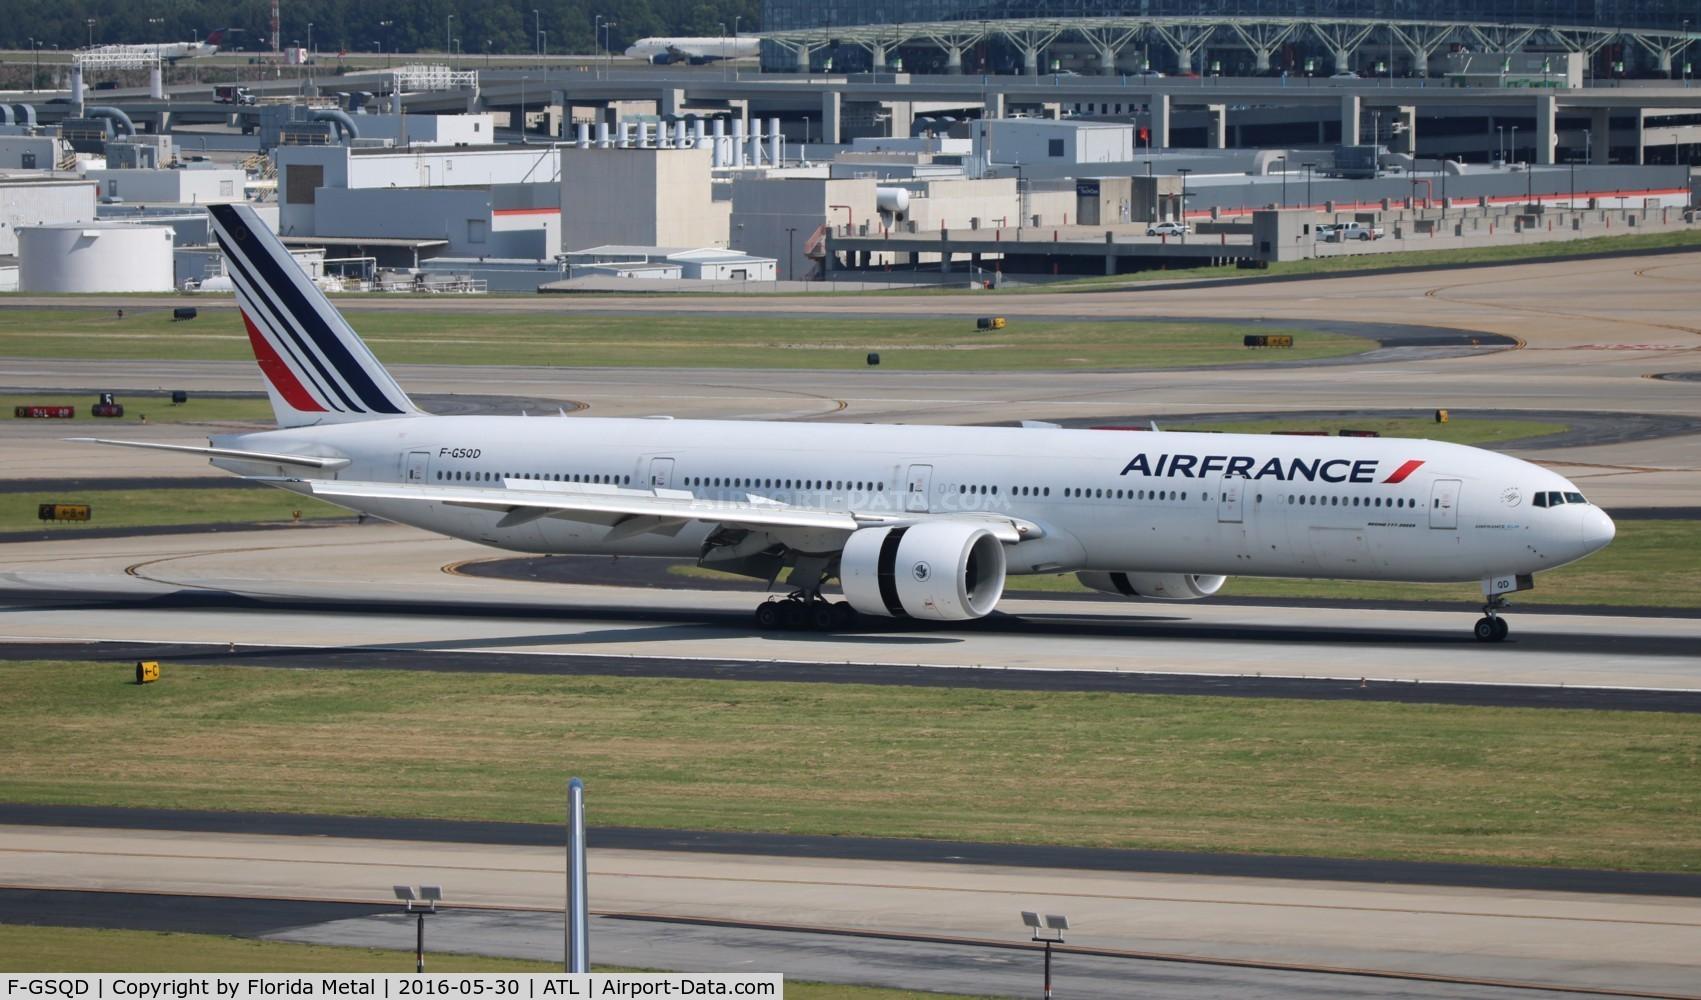 F-GSQD, 2004 Boeing 777-328/ER C/N 32726, Air France